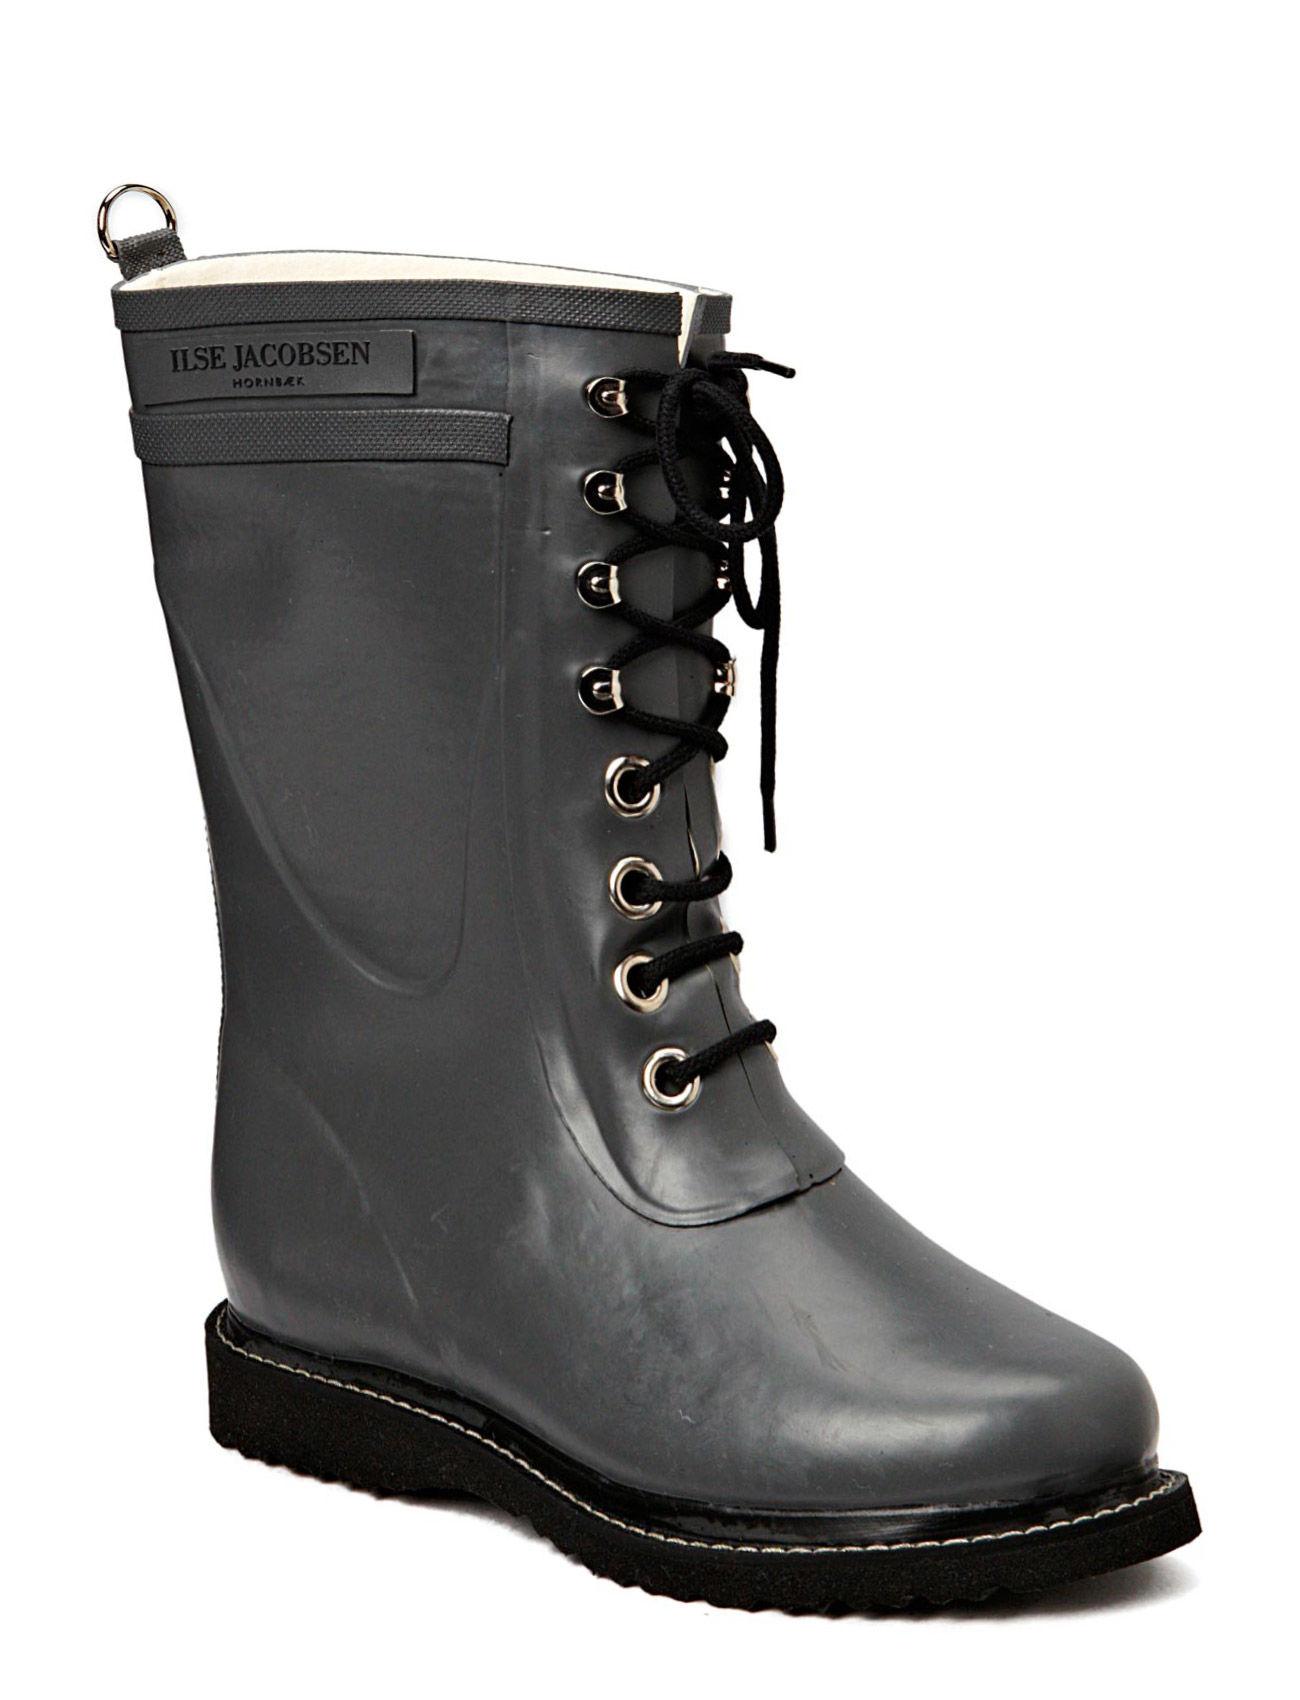 Rain Boot - Mid Calf, Classic With Laces Ilse Jacobsen Sko til Kvinder i Grå